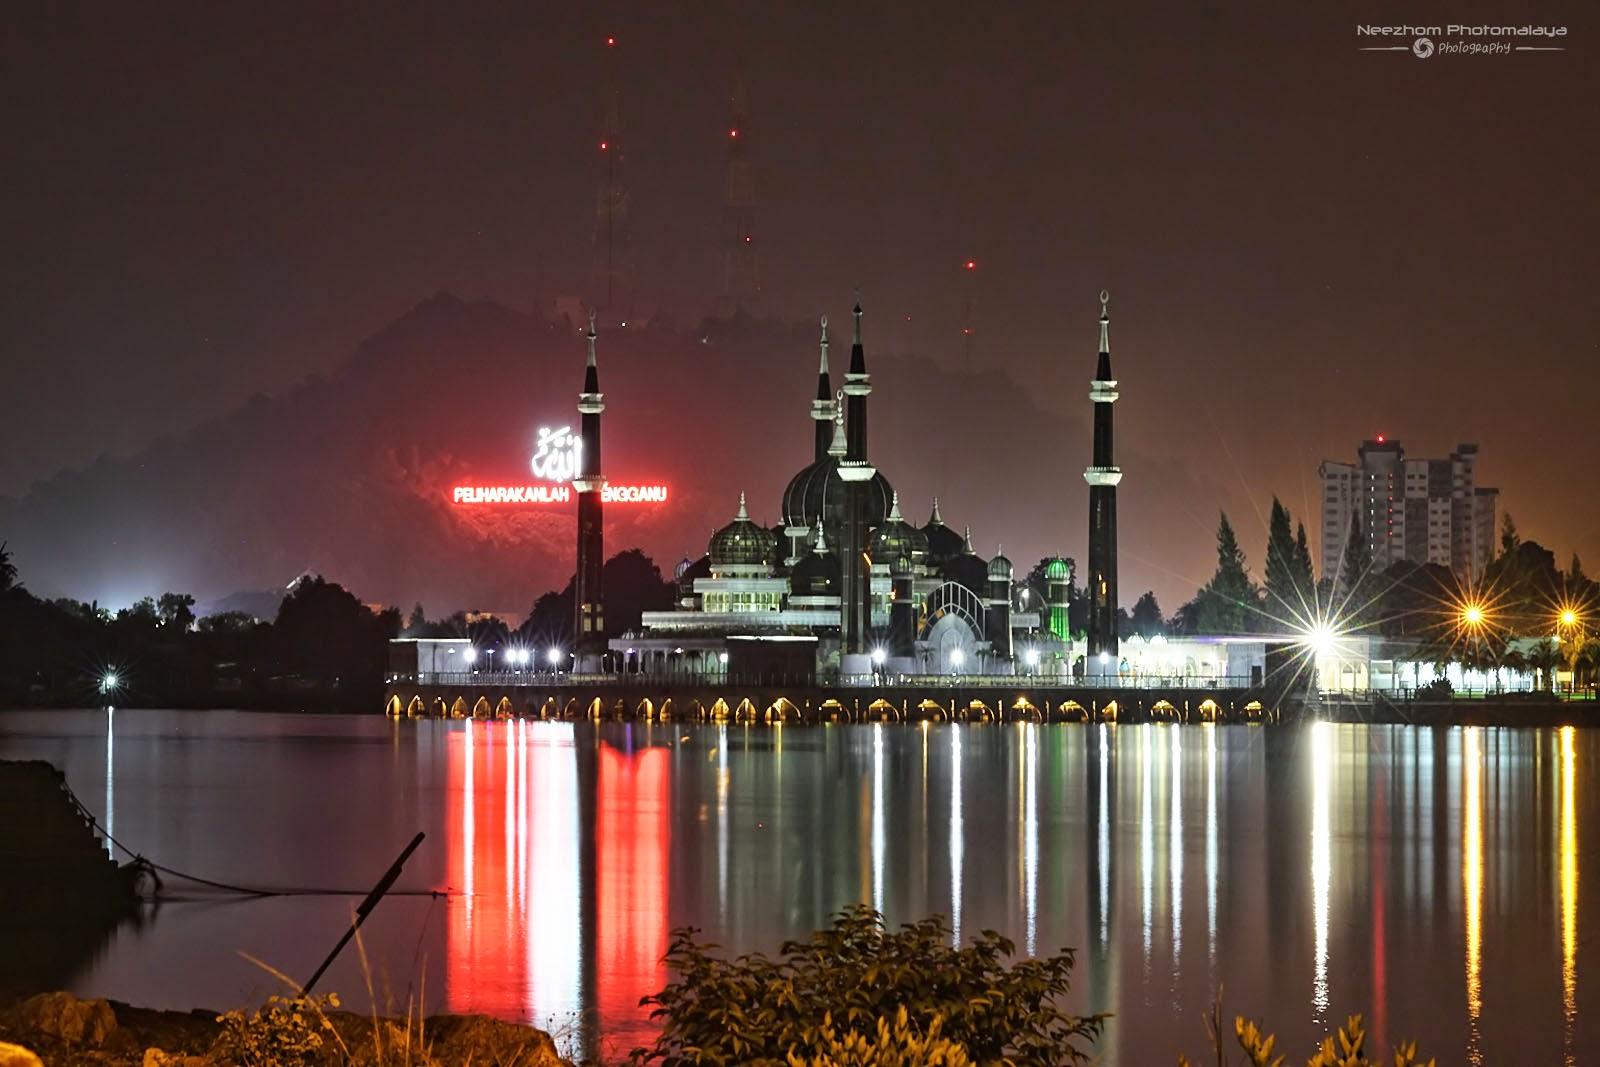 Signboard Allah Peliharakanlah Terengganu dan Masjid Kristal